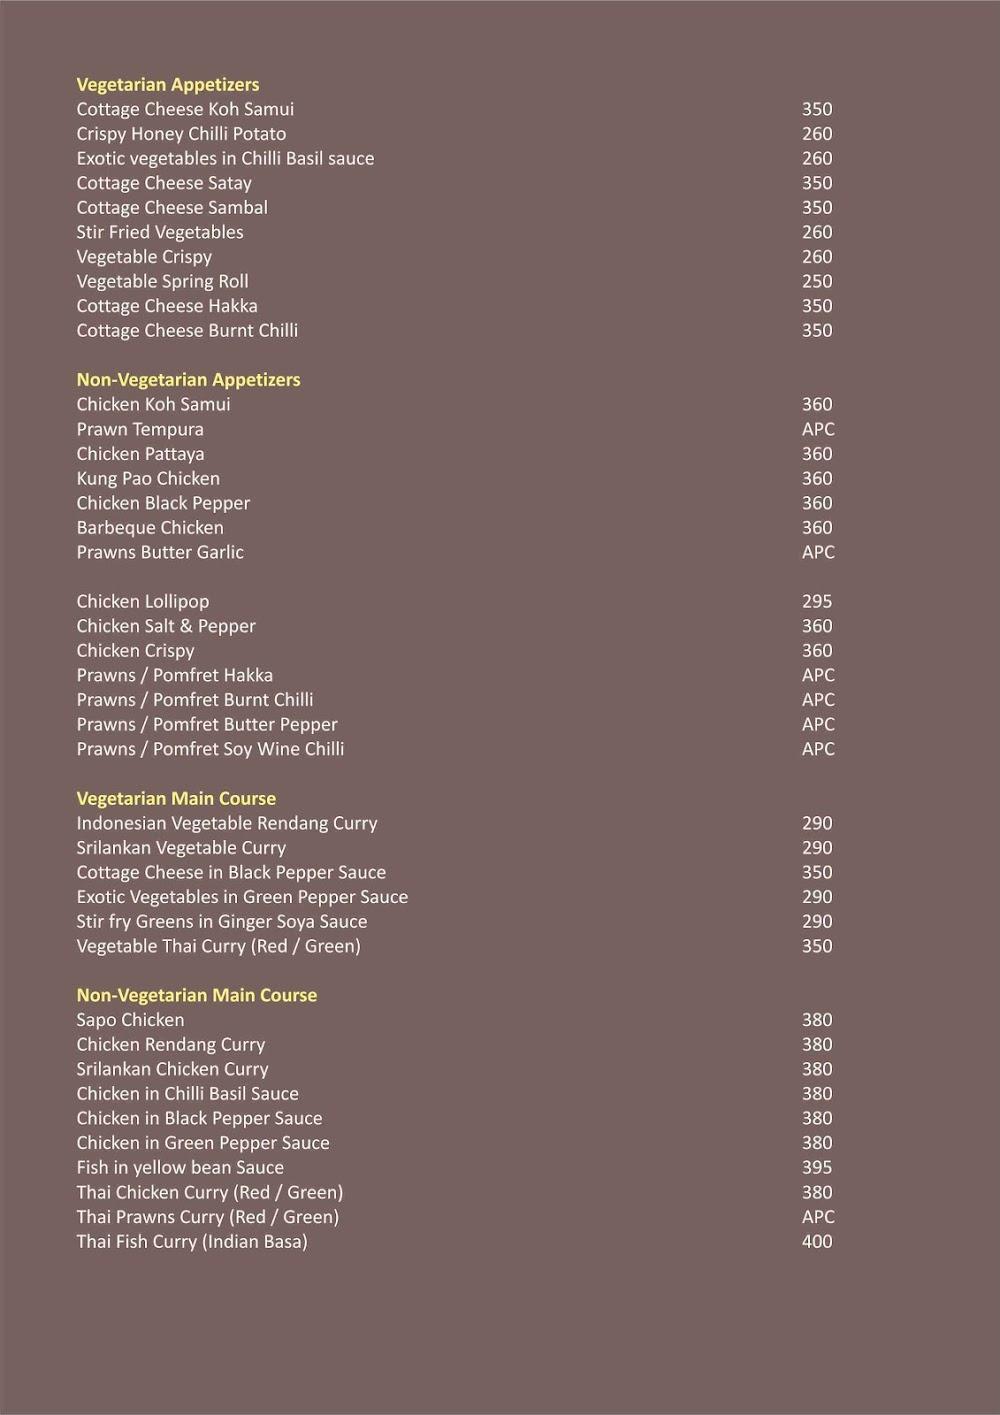 The Oaks - Lounge & Bar - GCC Hotel & Club menu 4